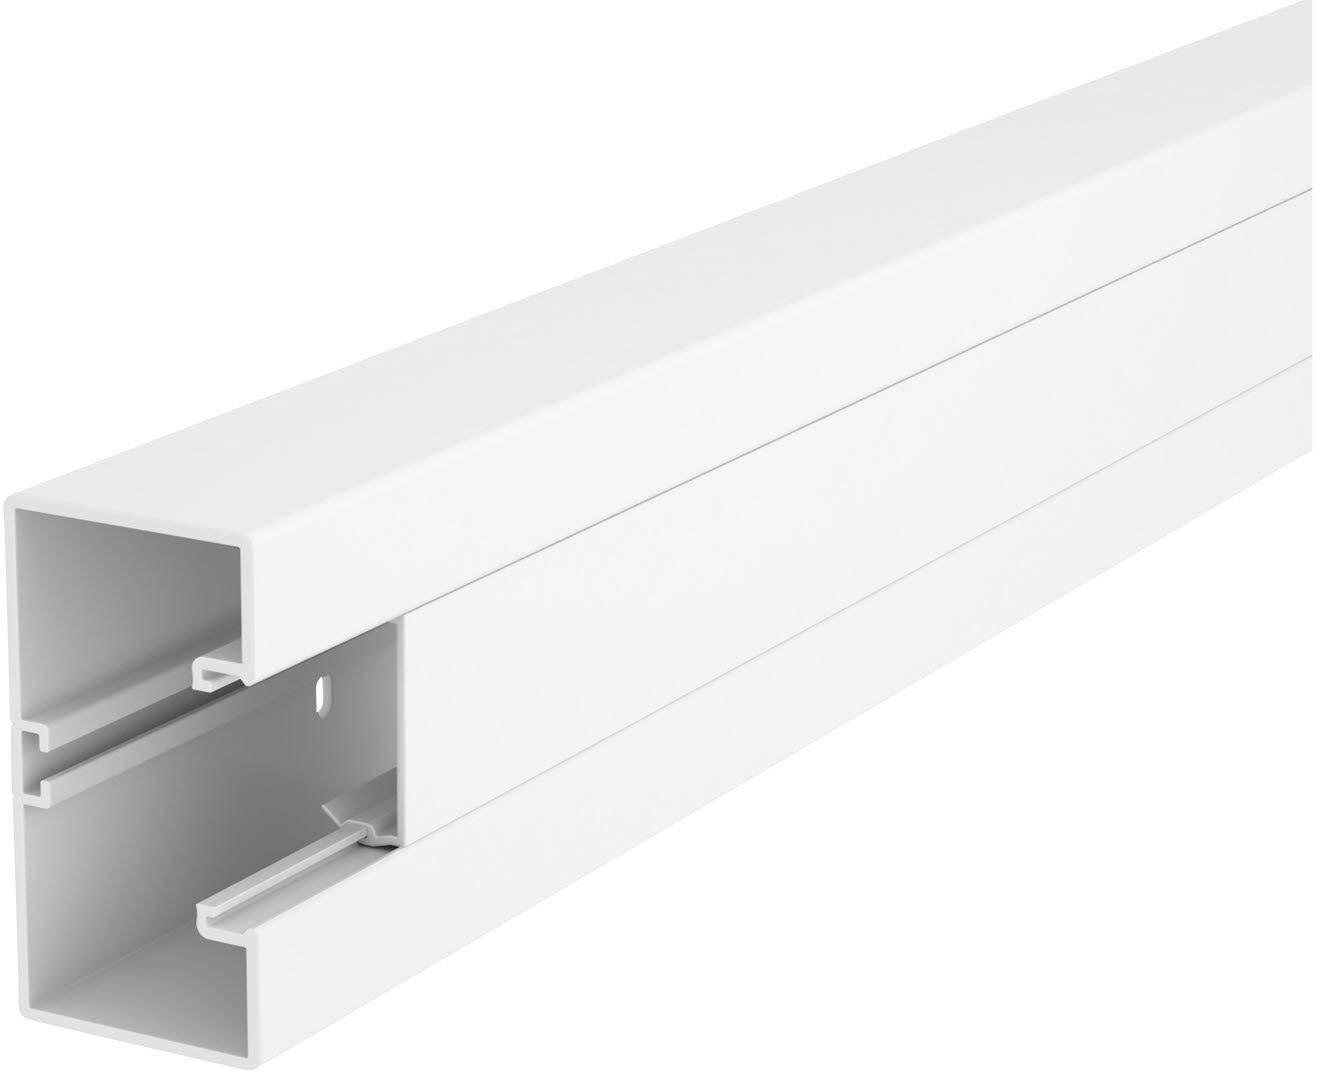 Lišta na kabely OBO Bettermann, 6116027, 100 x 53 mm, bílá